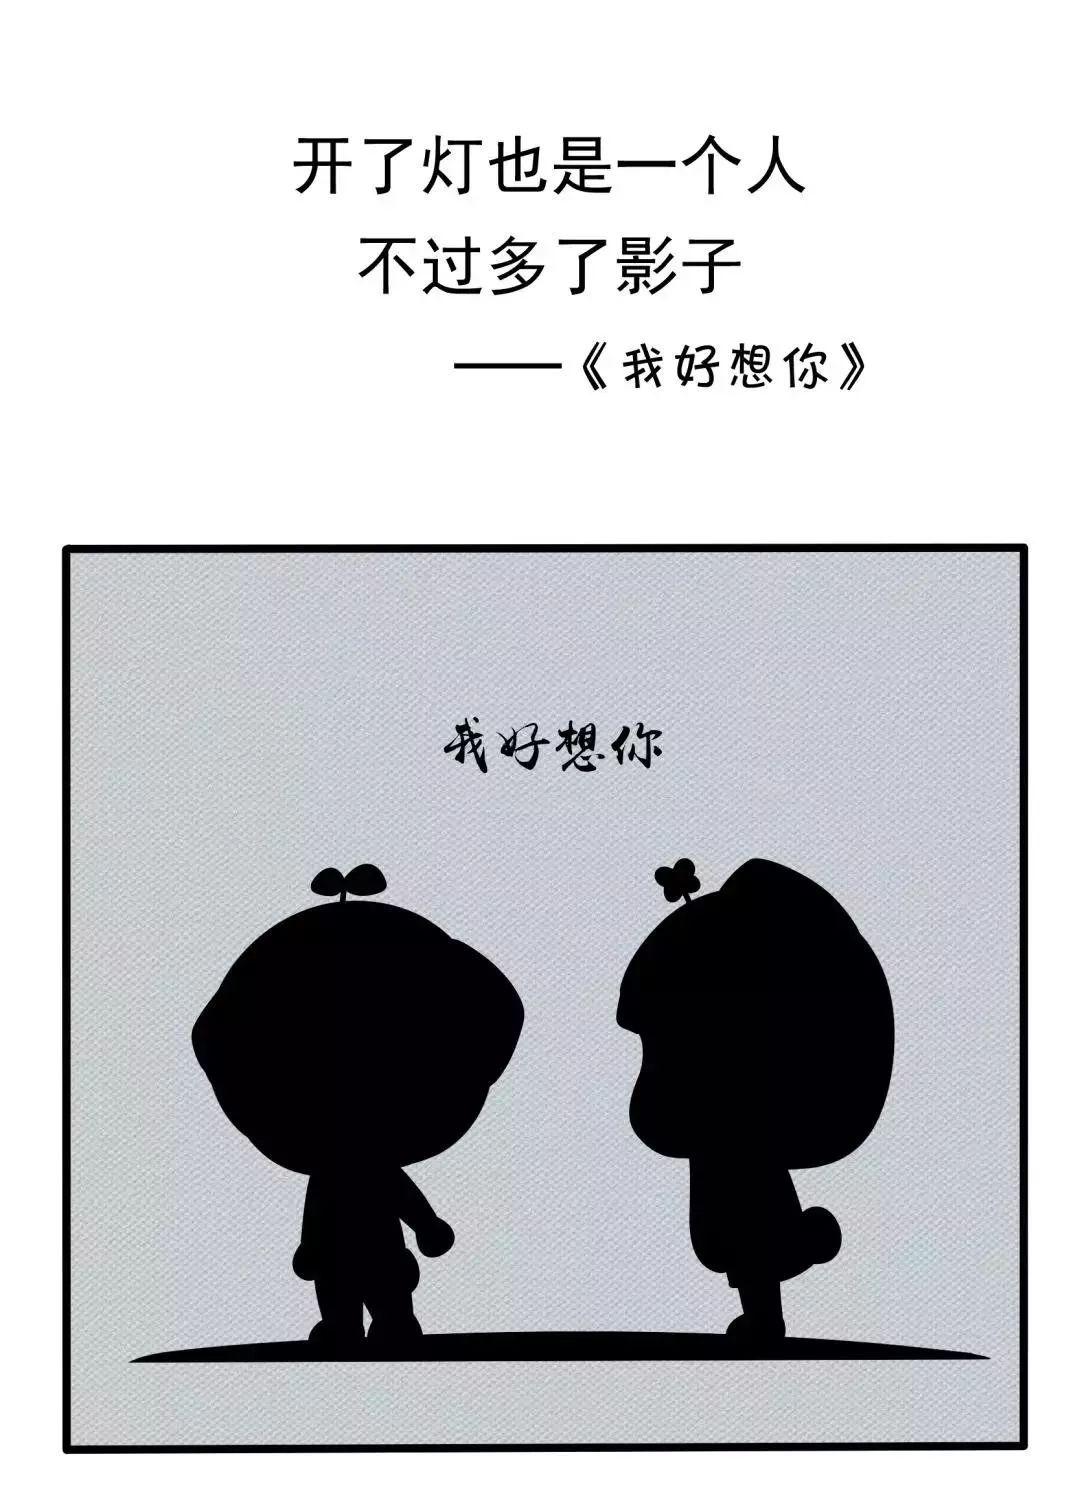 CH珠宝情感 青梅竹马还是会败给一见钟情的(图4)